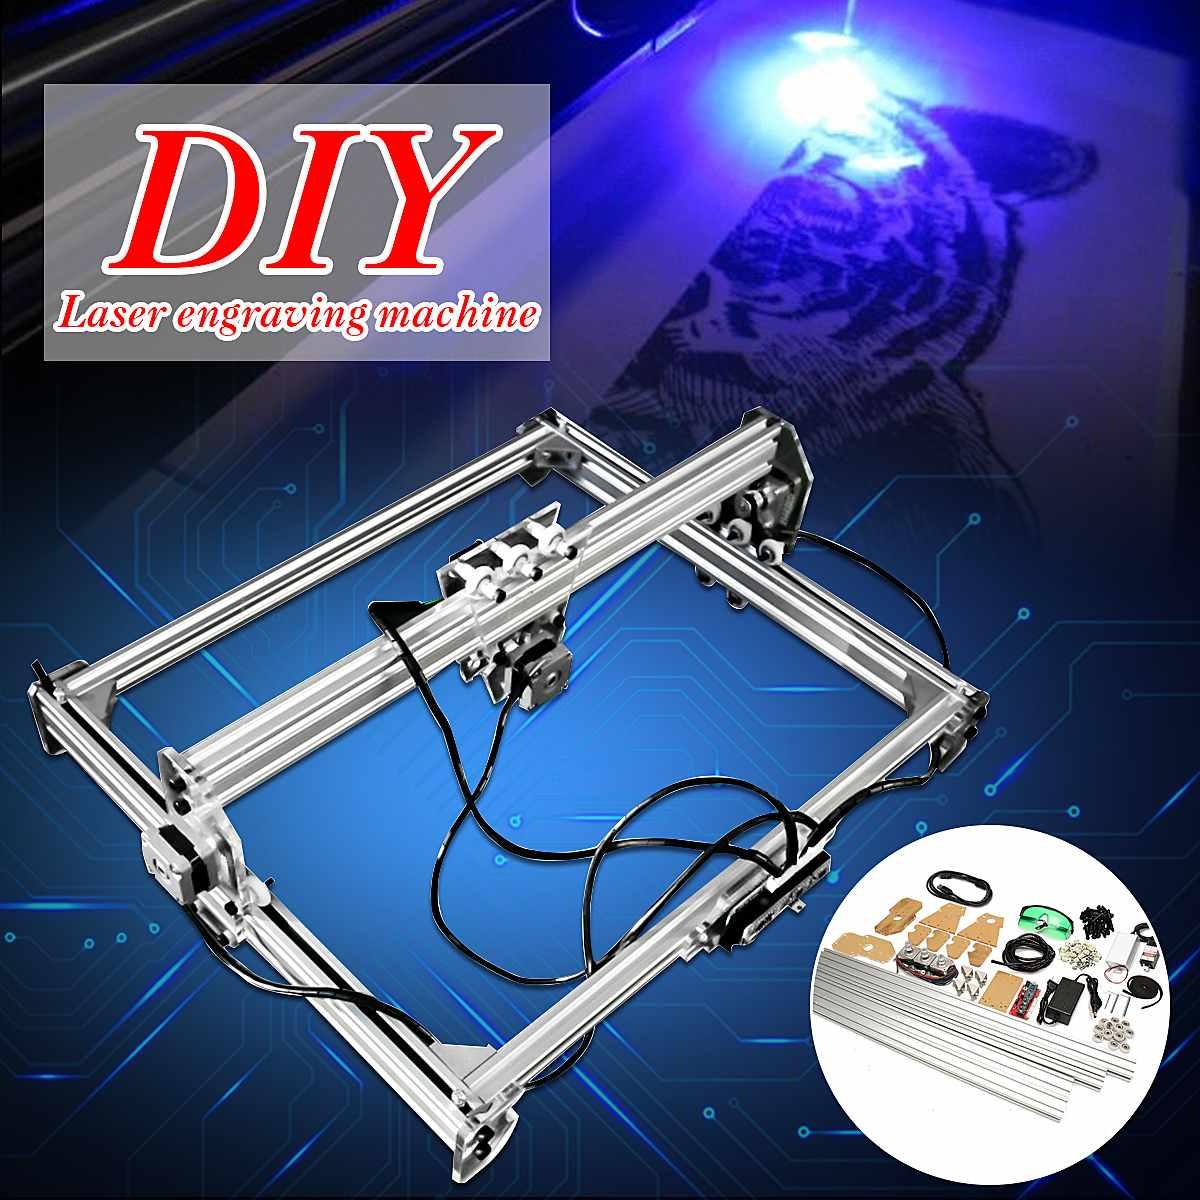 50*65cm 15W CNC Laser Engraver Engraving Machine For Metal/Wood Router/DIY Cutter 2Axis Engraver Desktop Cutter+ Laser